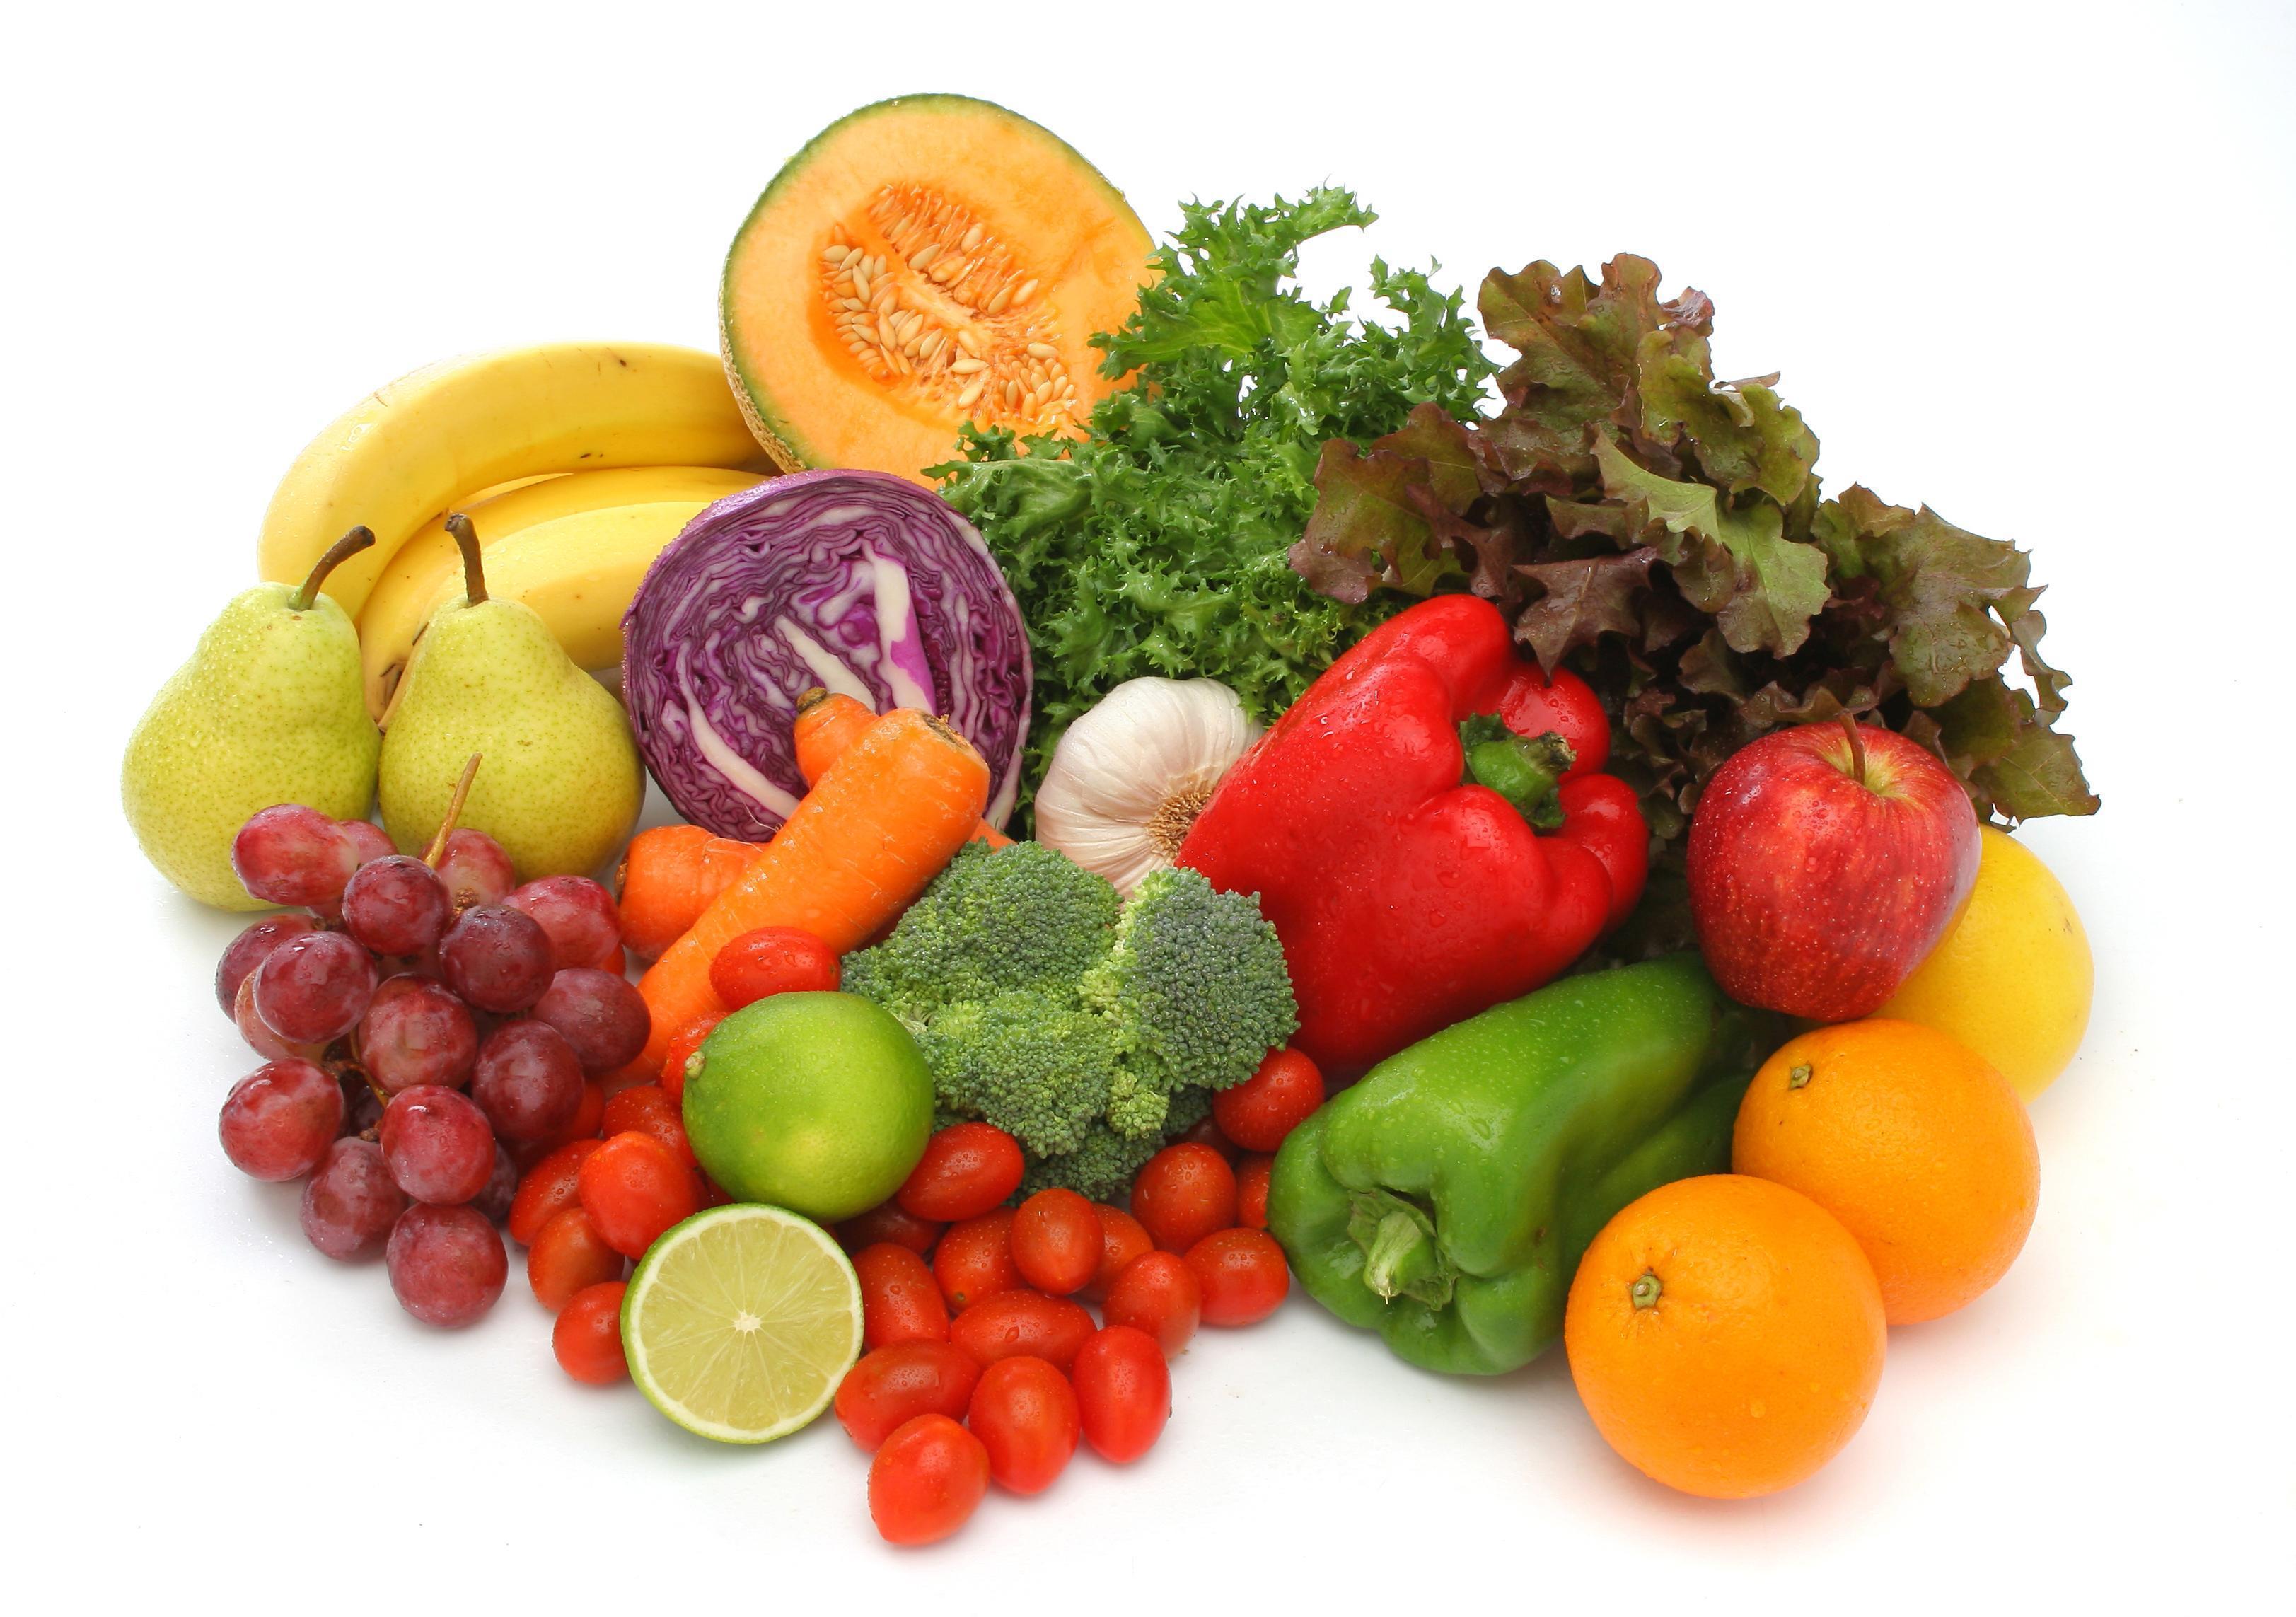 Aumentar a Serotonina – Alimentos Para Aumentar a Serotonina